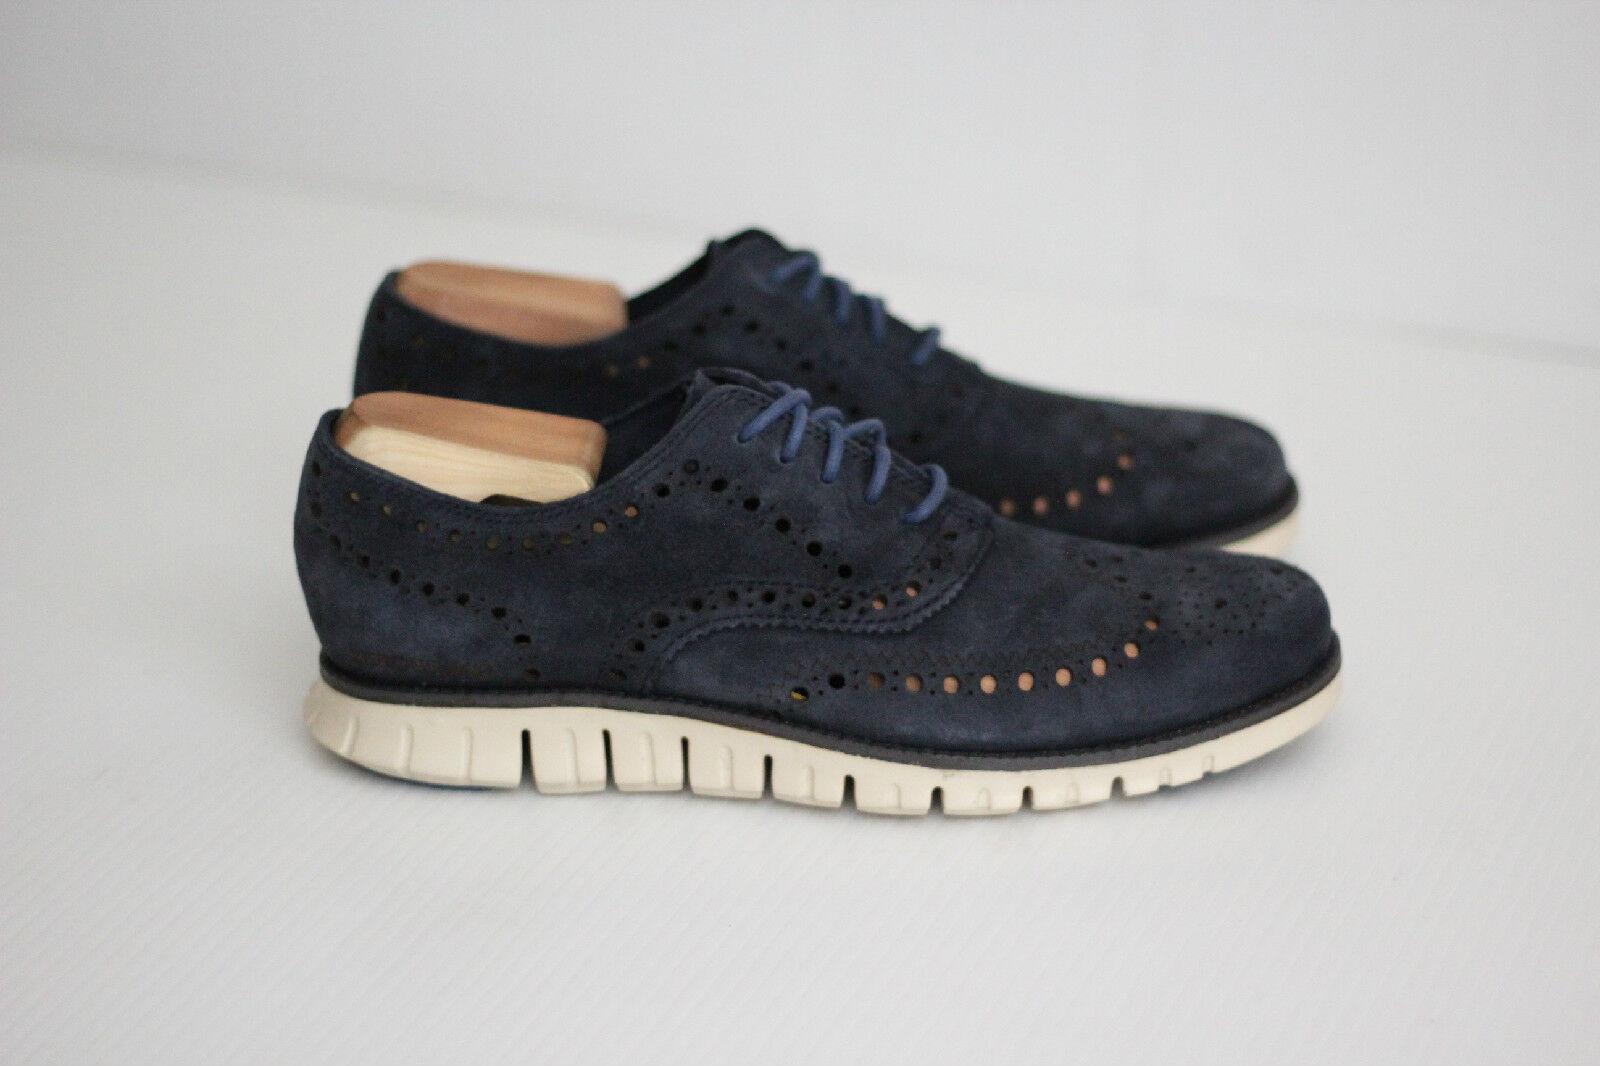 Cole Haan ZeroGrand Wingtip Oxford shoes - Navy bluee Suede - 8 M - C20128  (Y37)